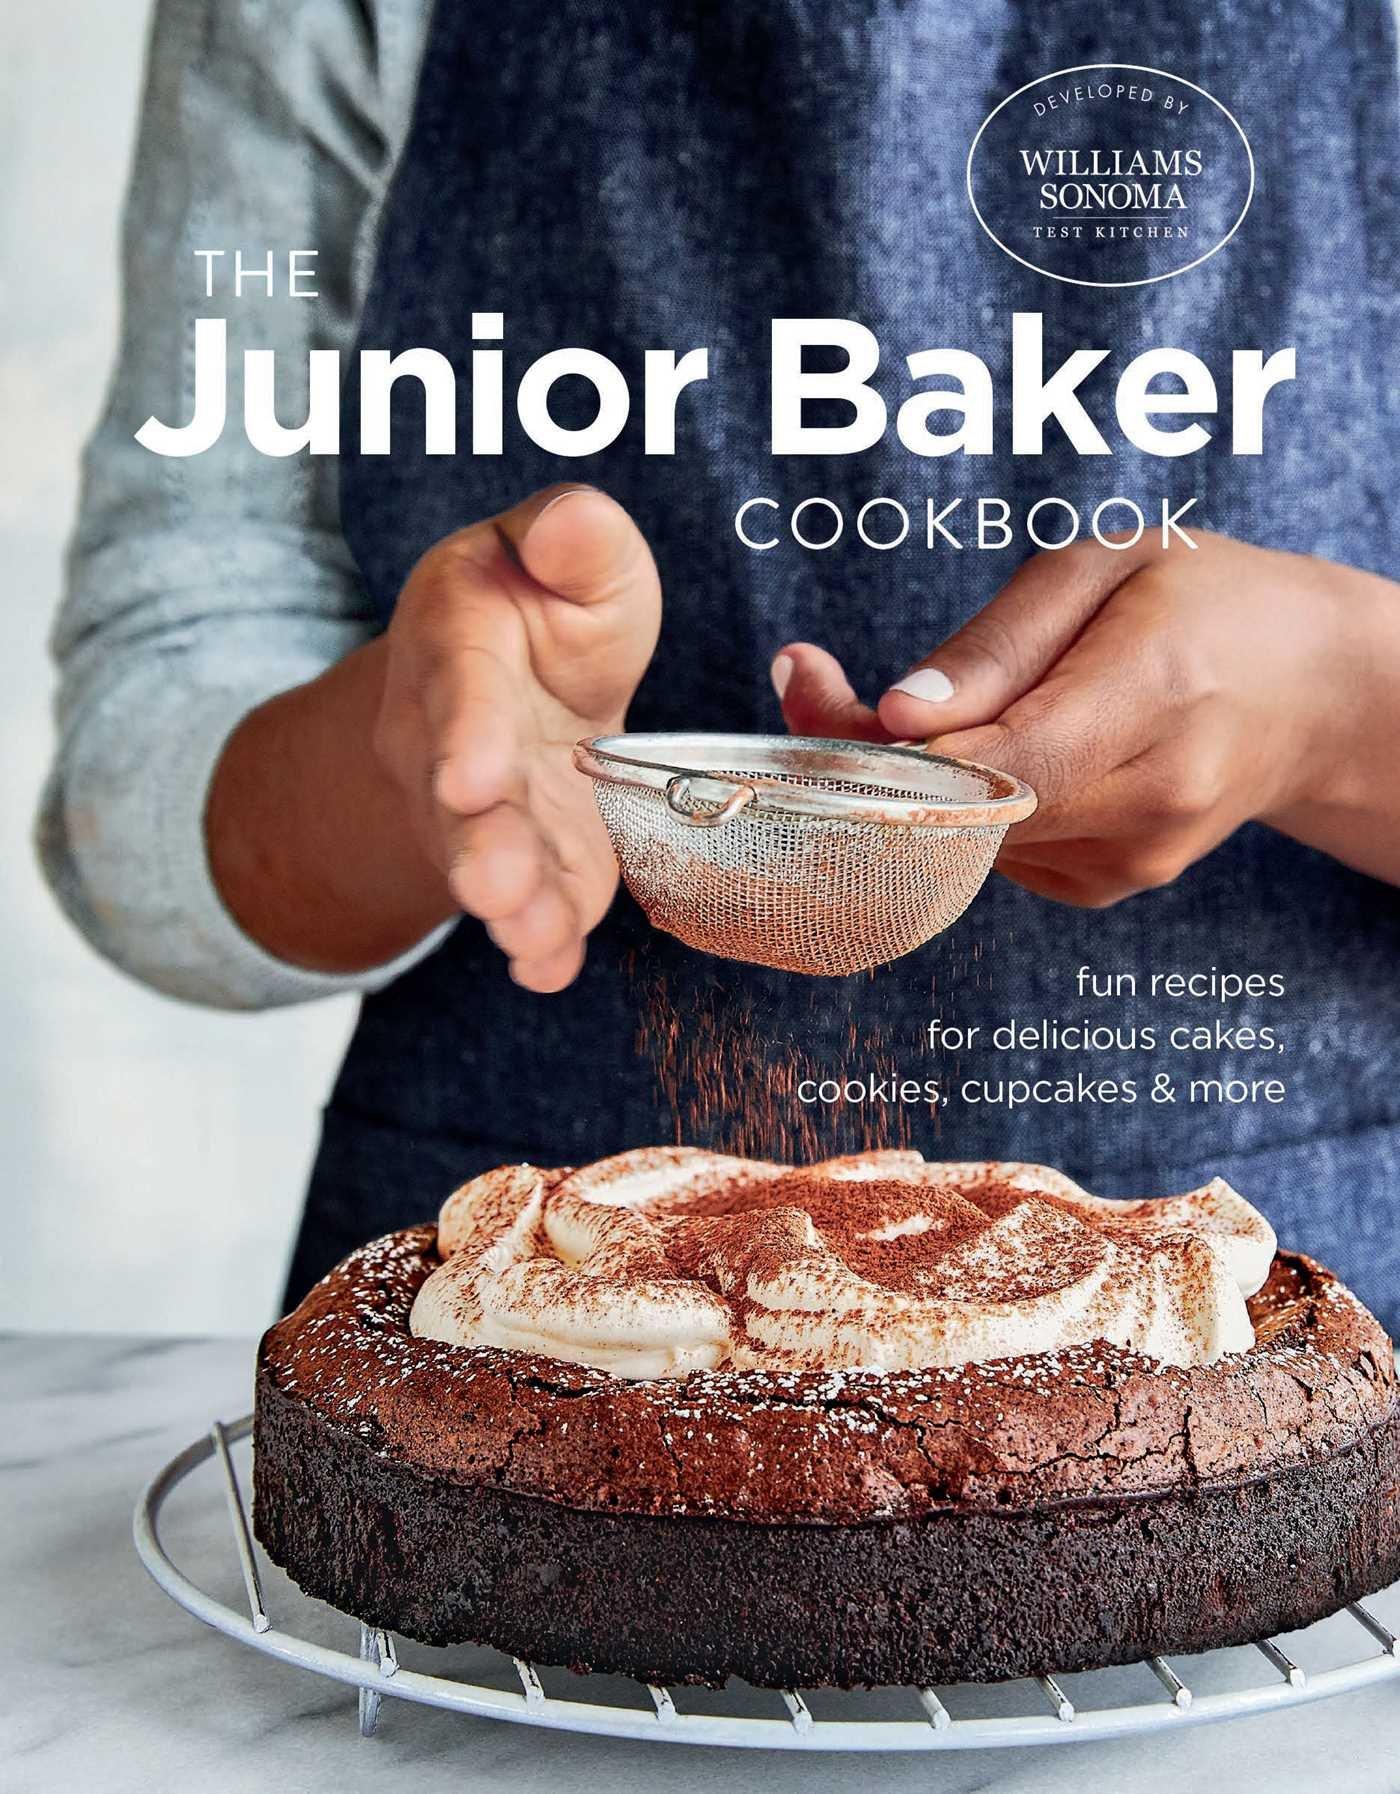 Junior Baker Williams Sonoma Kitchen product image